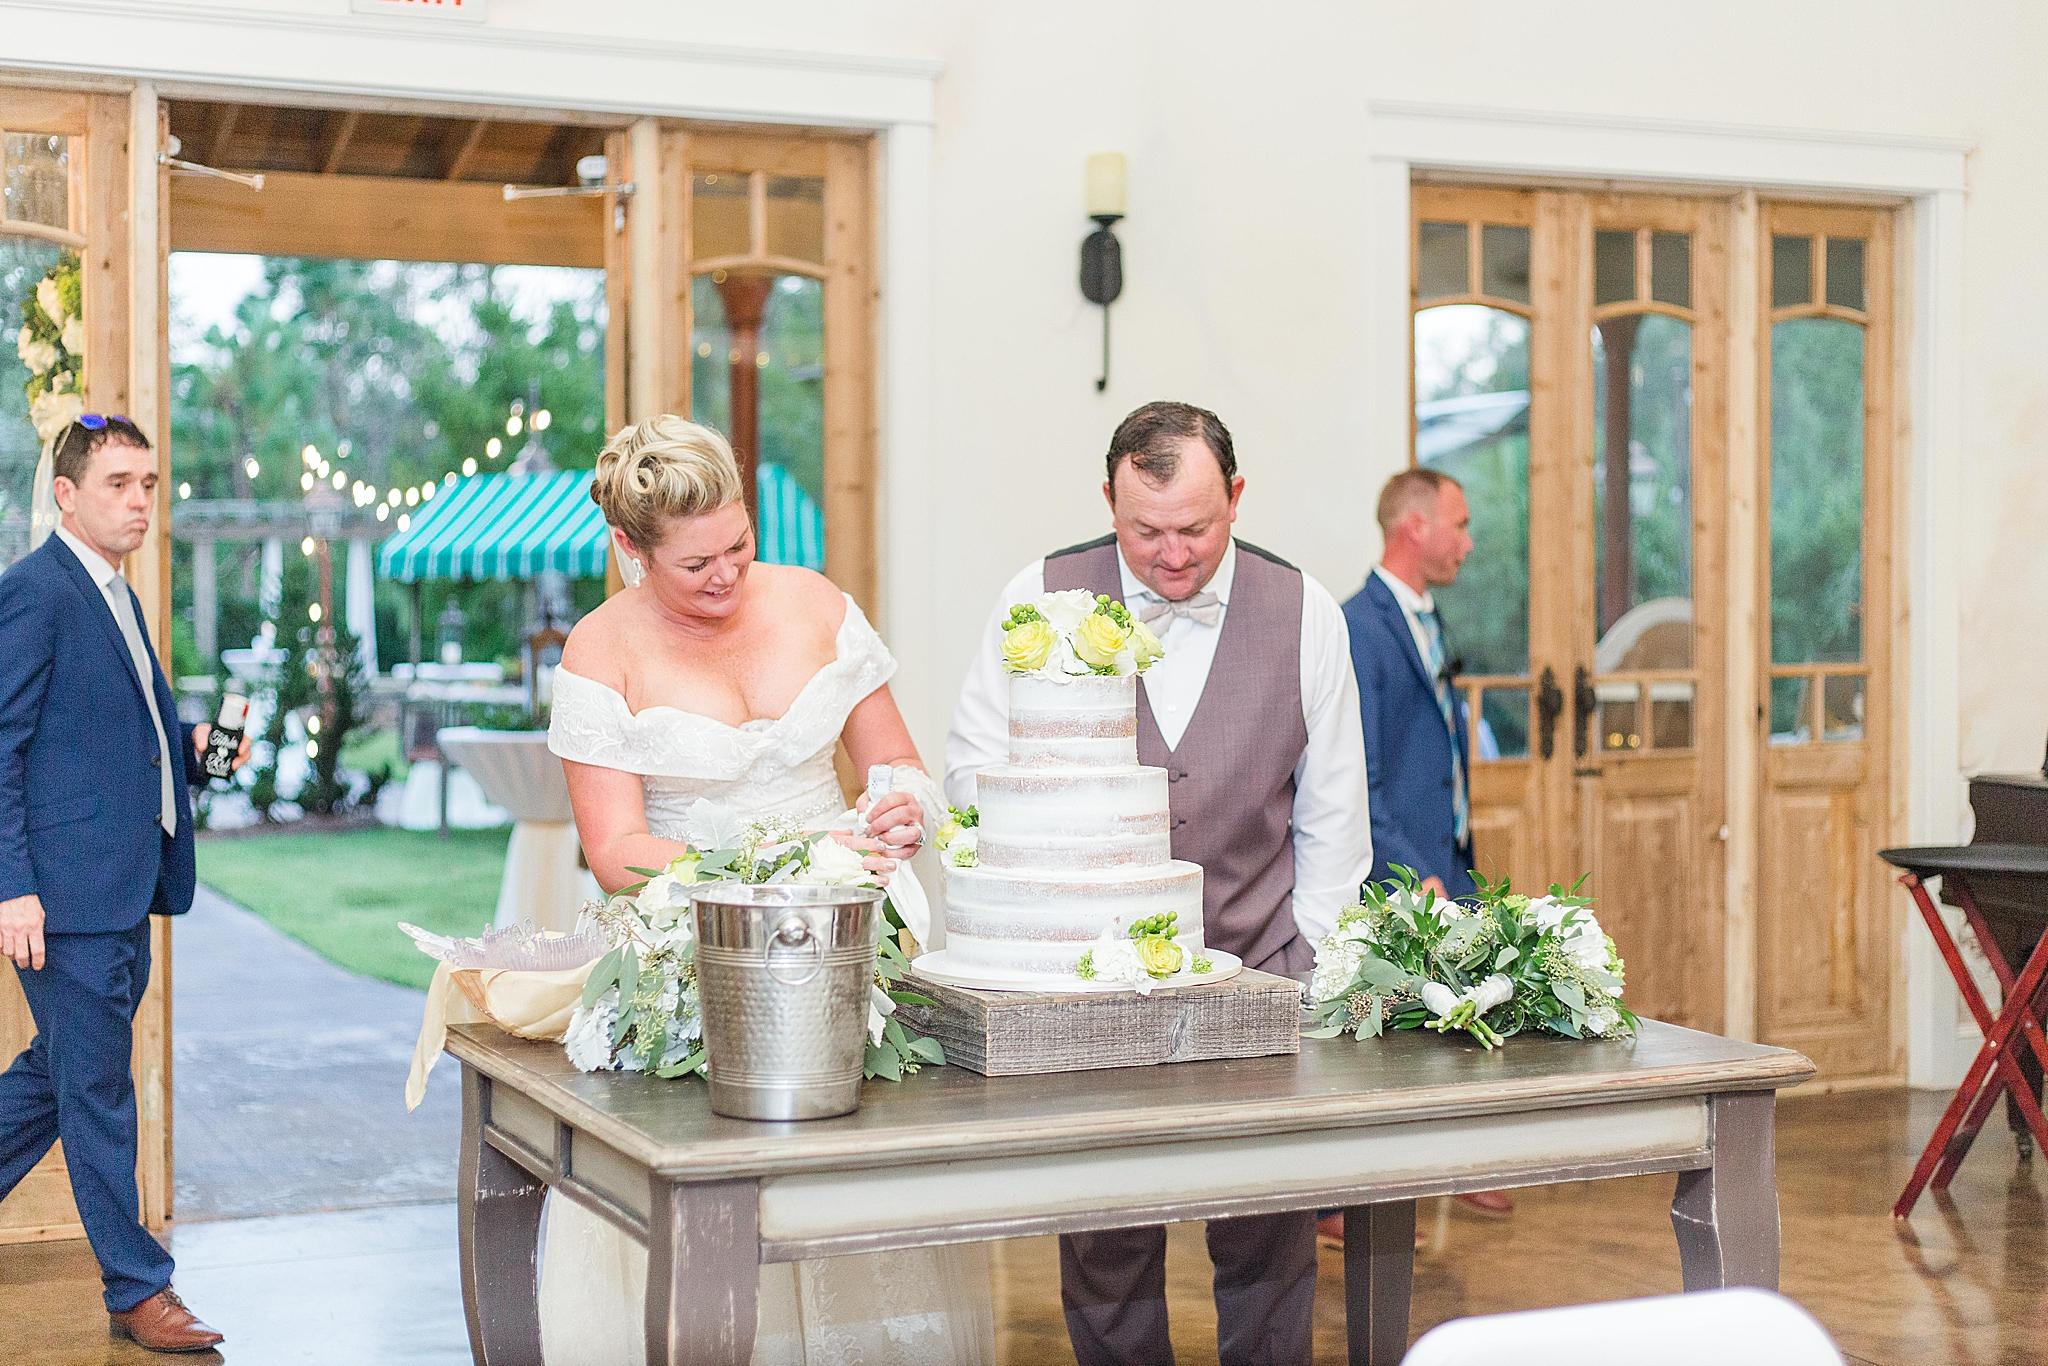 newlyweds cut wedding cake at Bella Sera Gardens